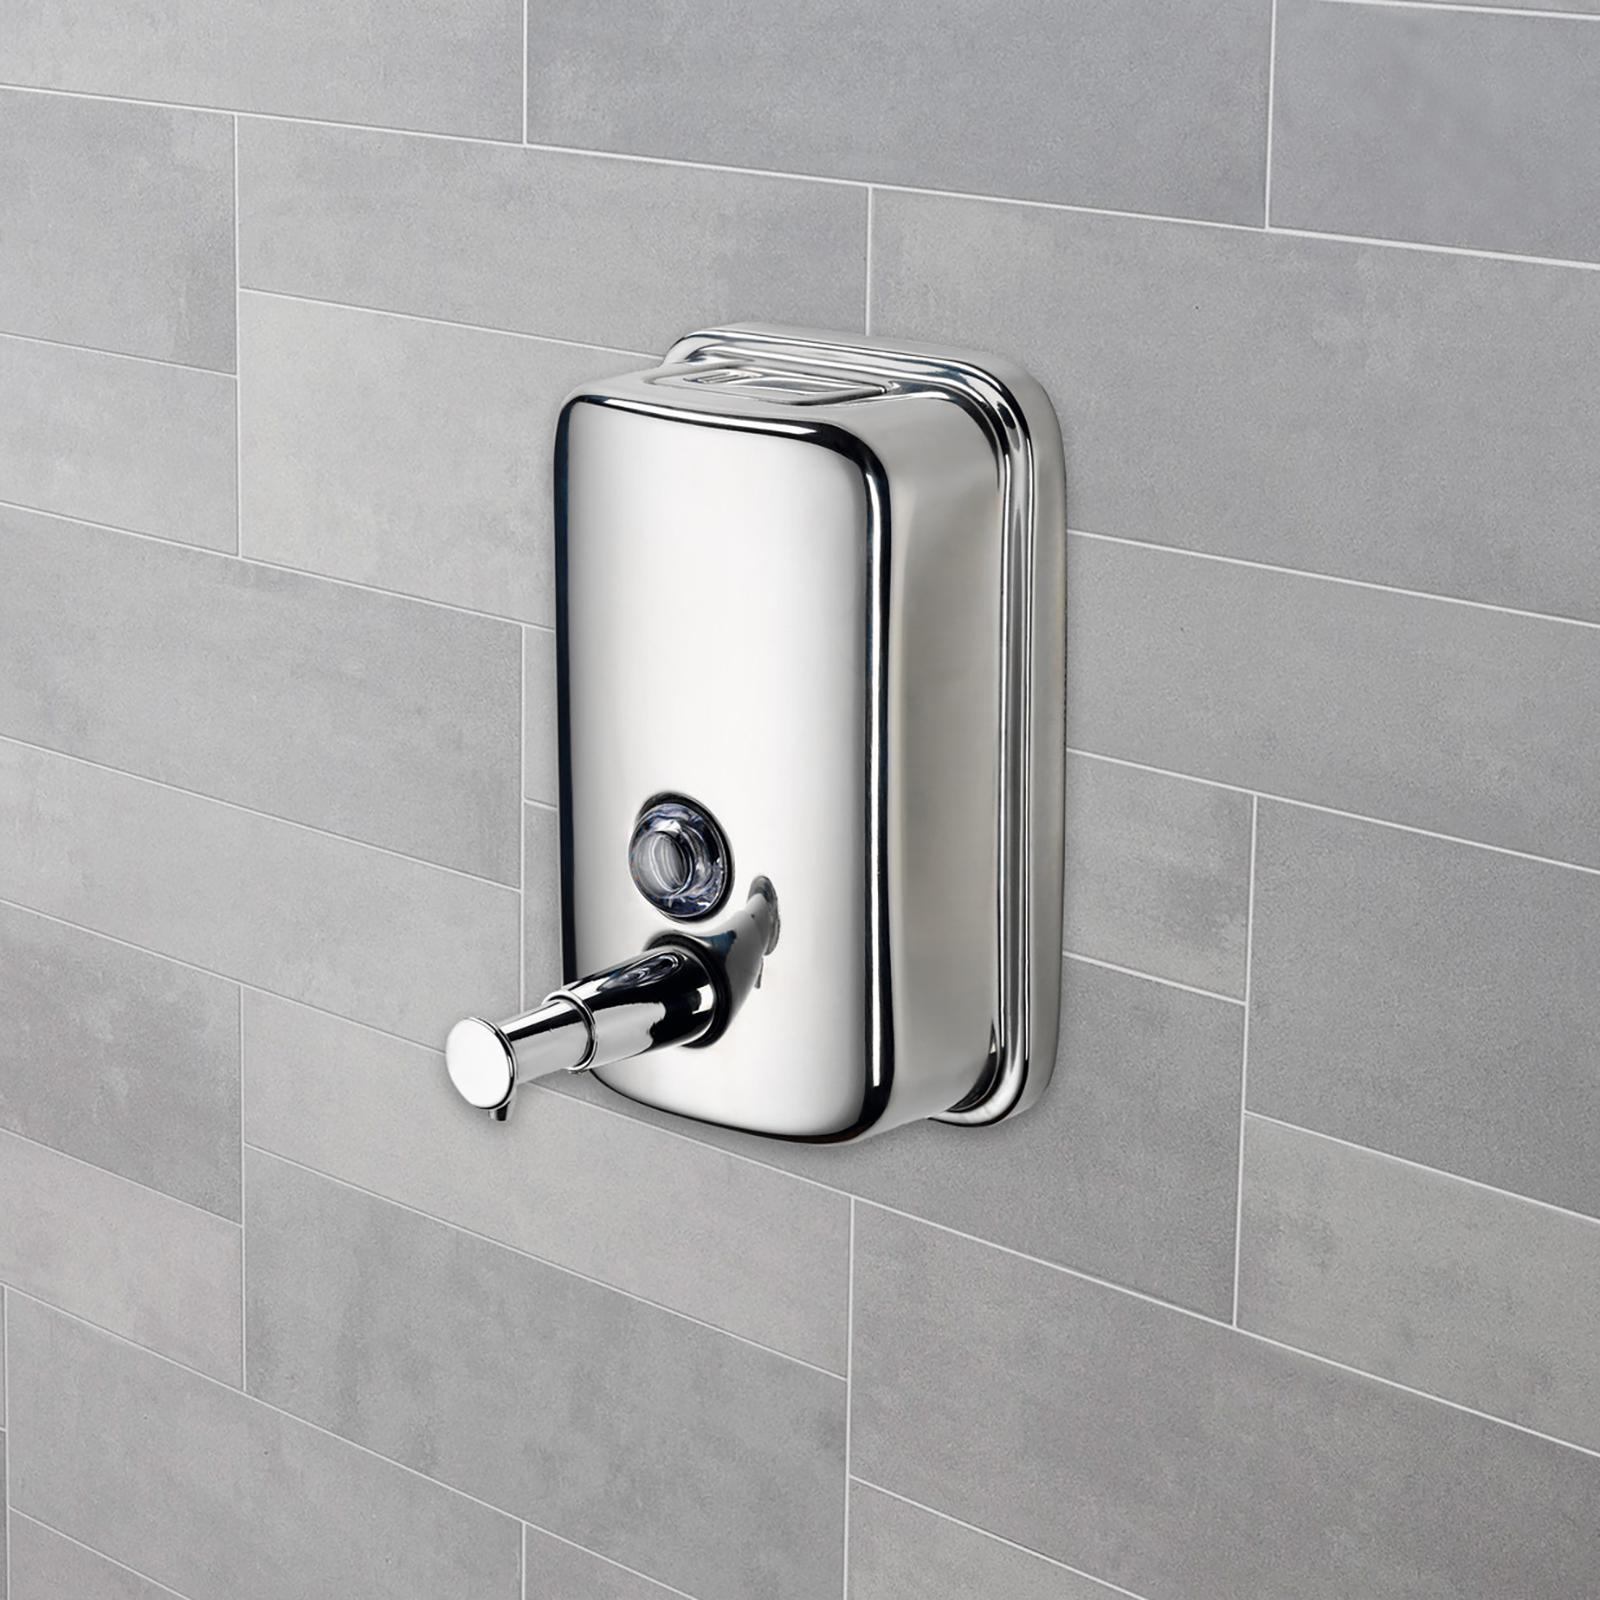 Shower Soap Dispenser ~ Hartleys chrome bathroom toilet shower wall soap shampoo